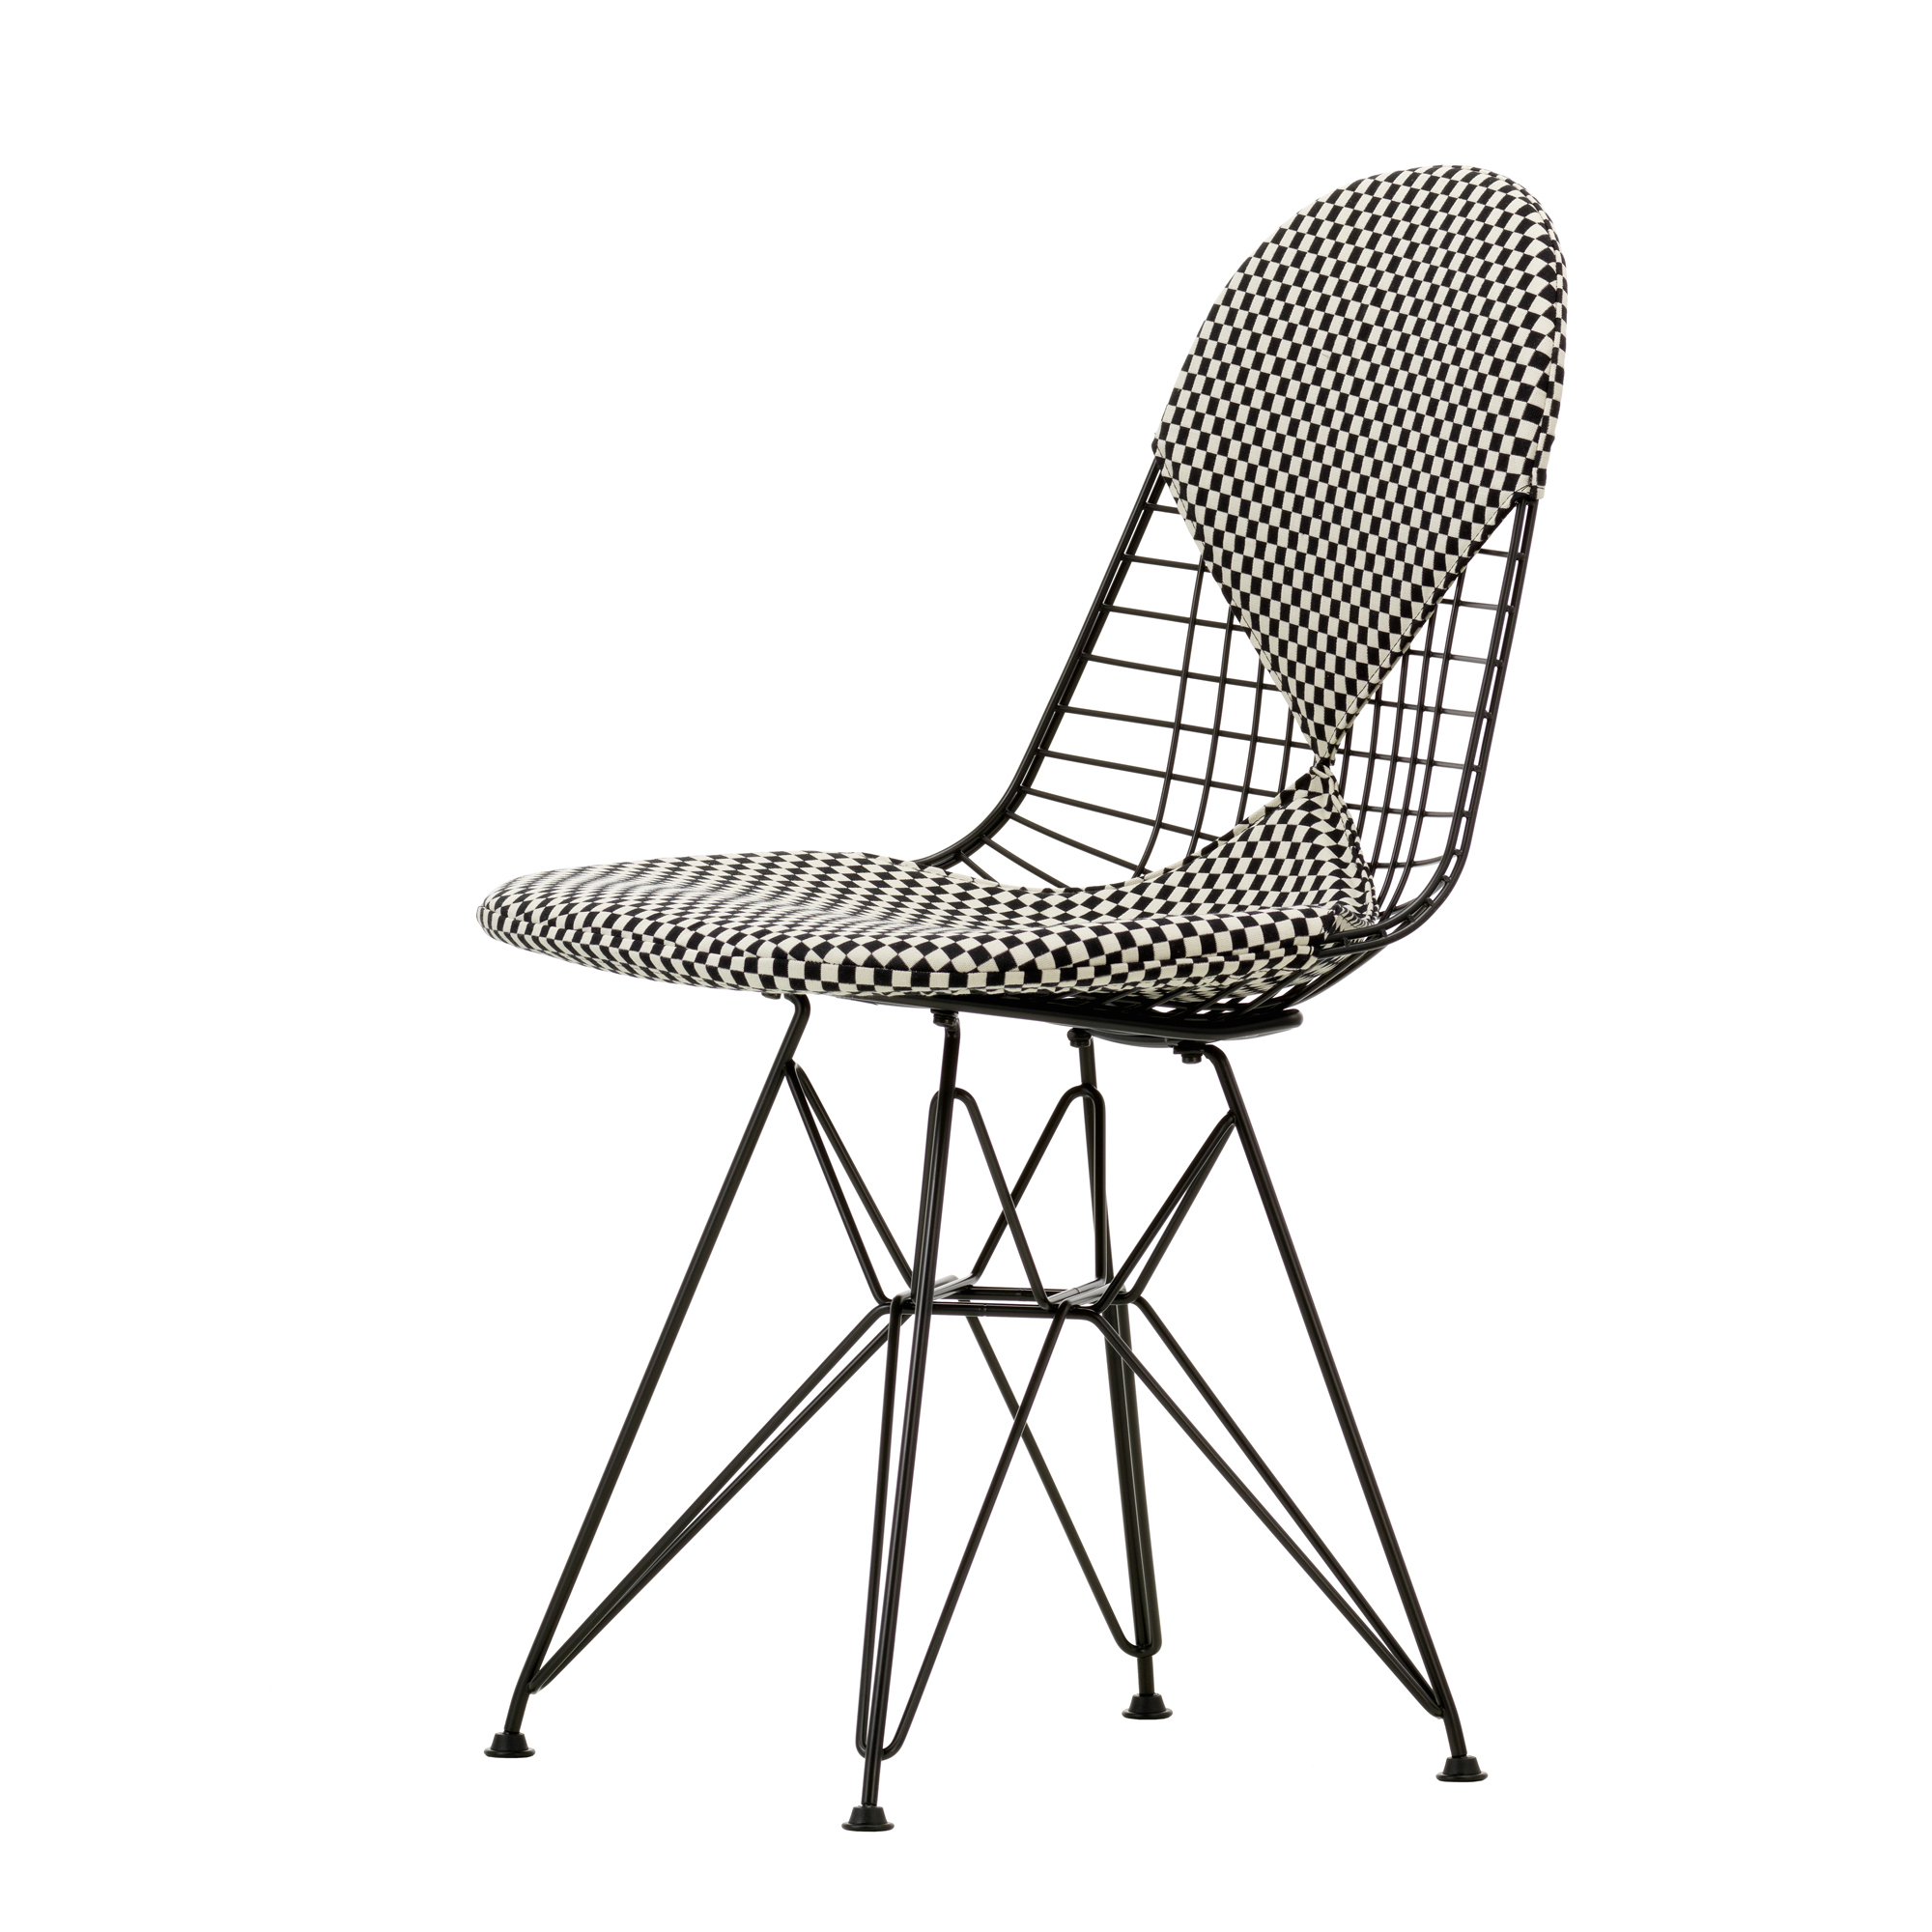 Wire Dkr Bikini Stuhl Chair Vitra Eames XnOkNwP80